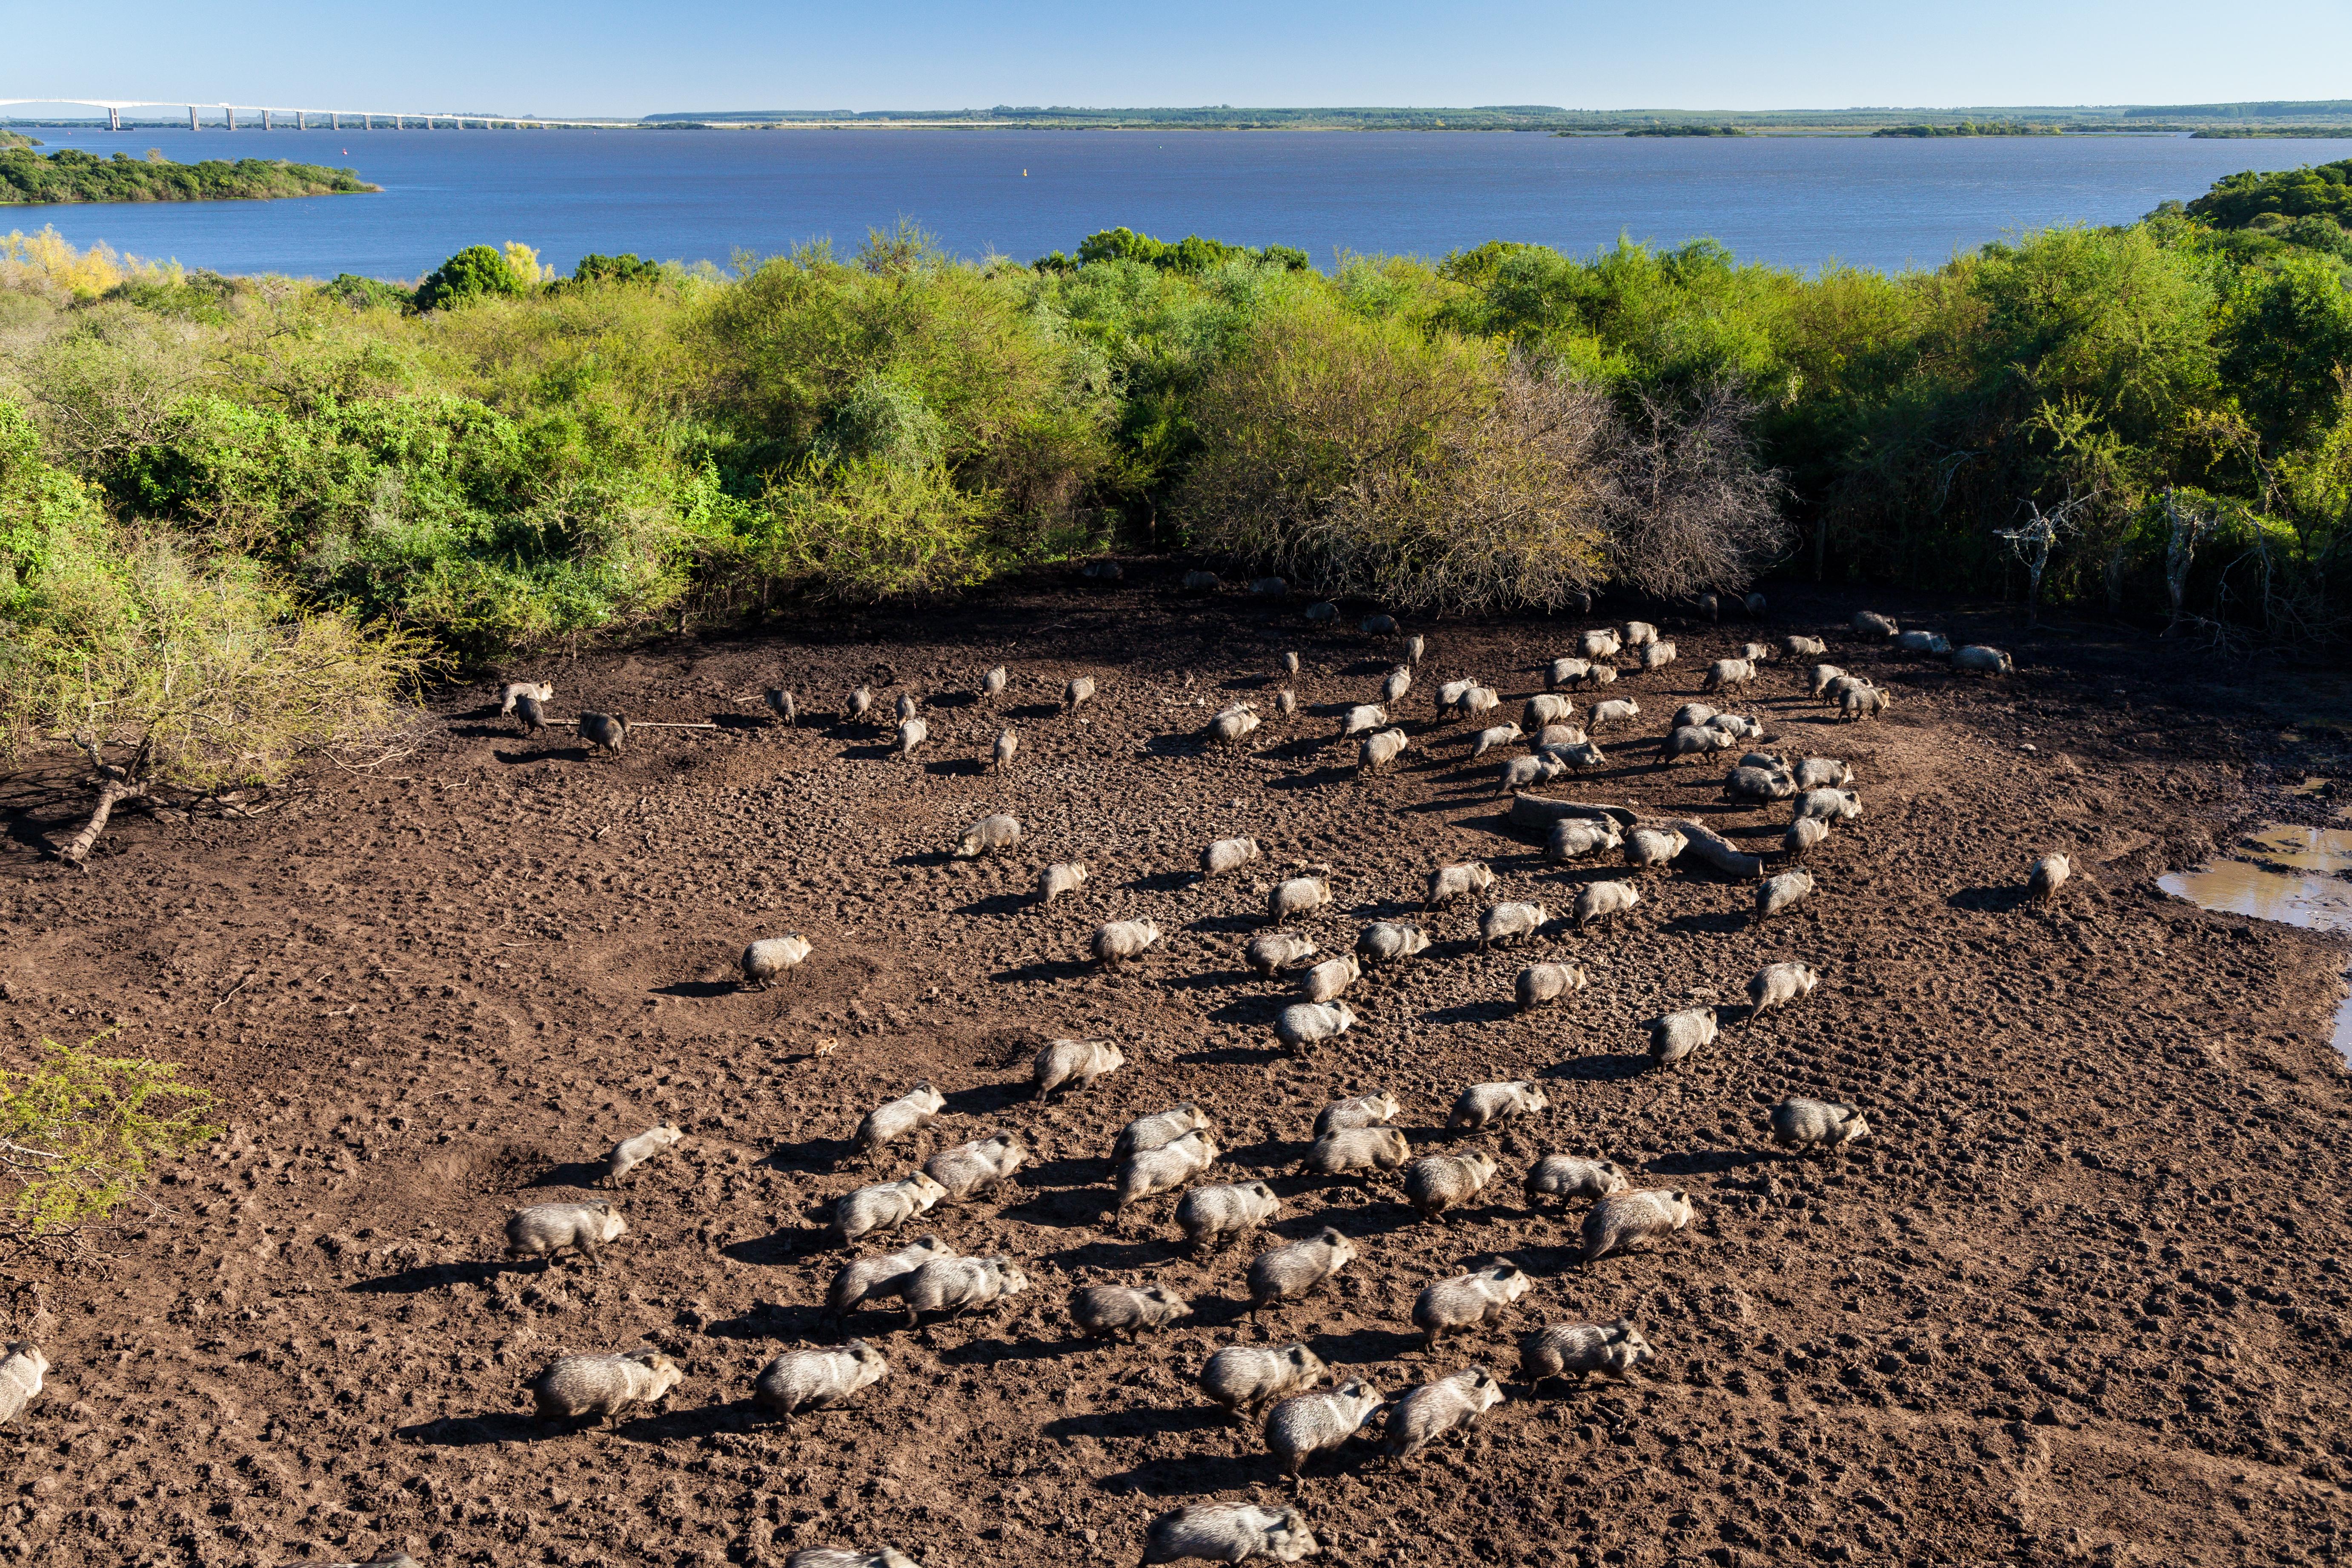 Pecaríes de collar liberados por Montes del Plata se adaptaron a su hábitat natural